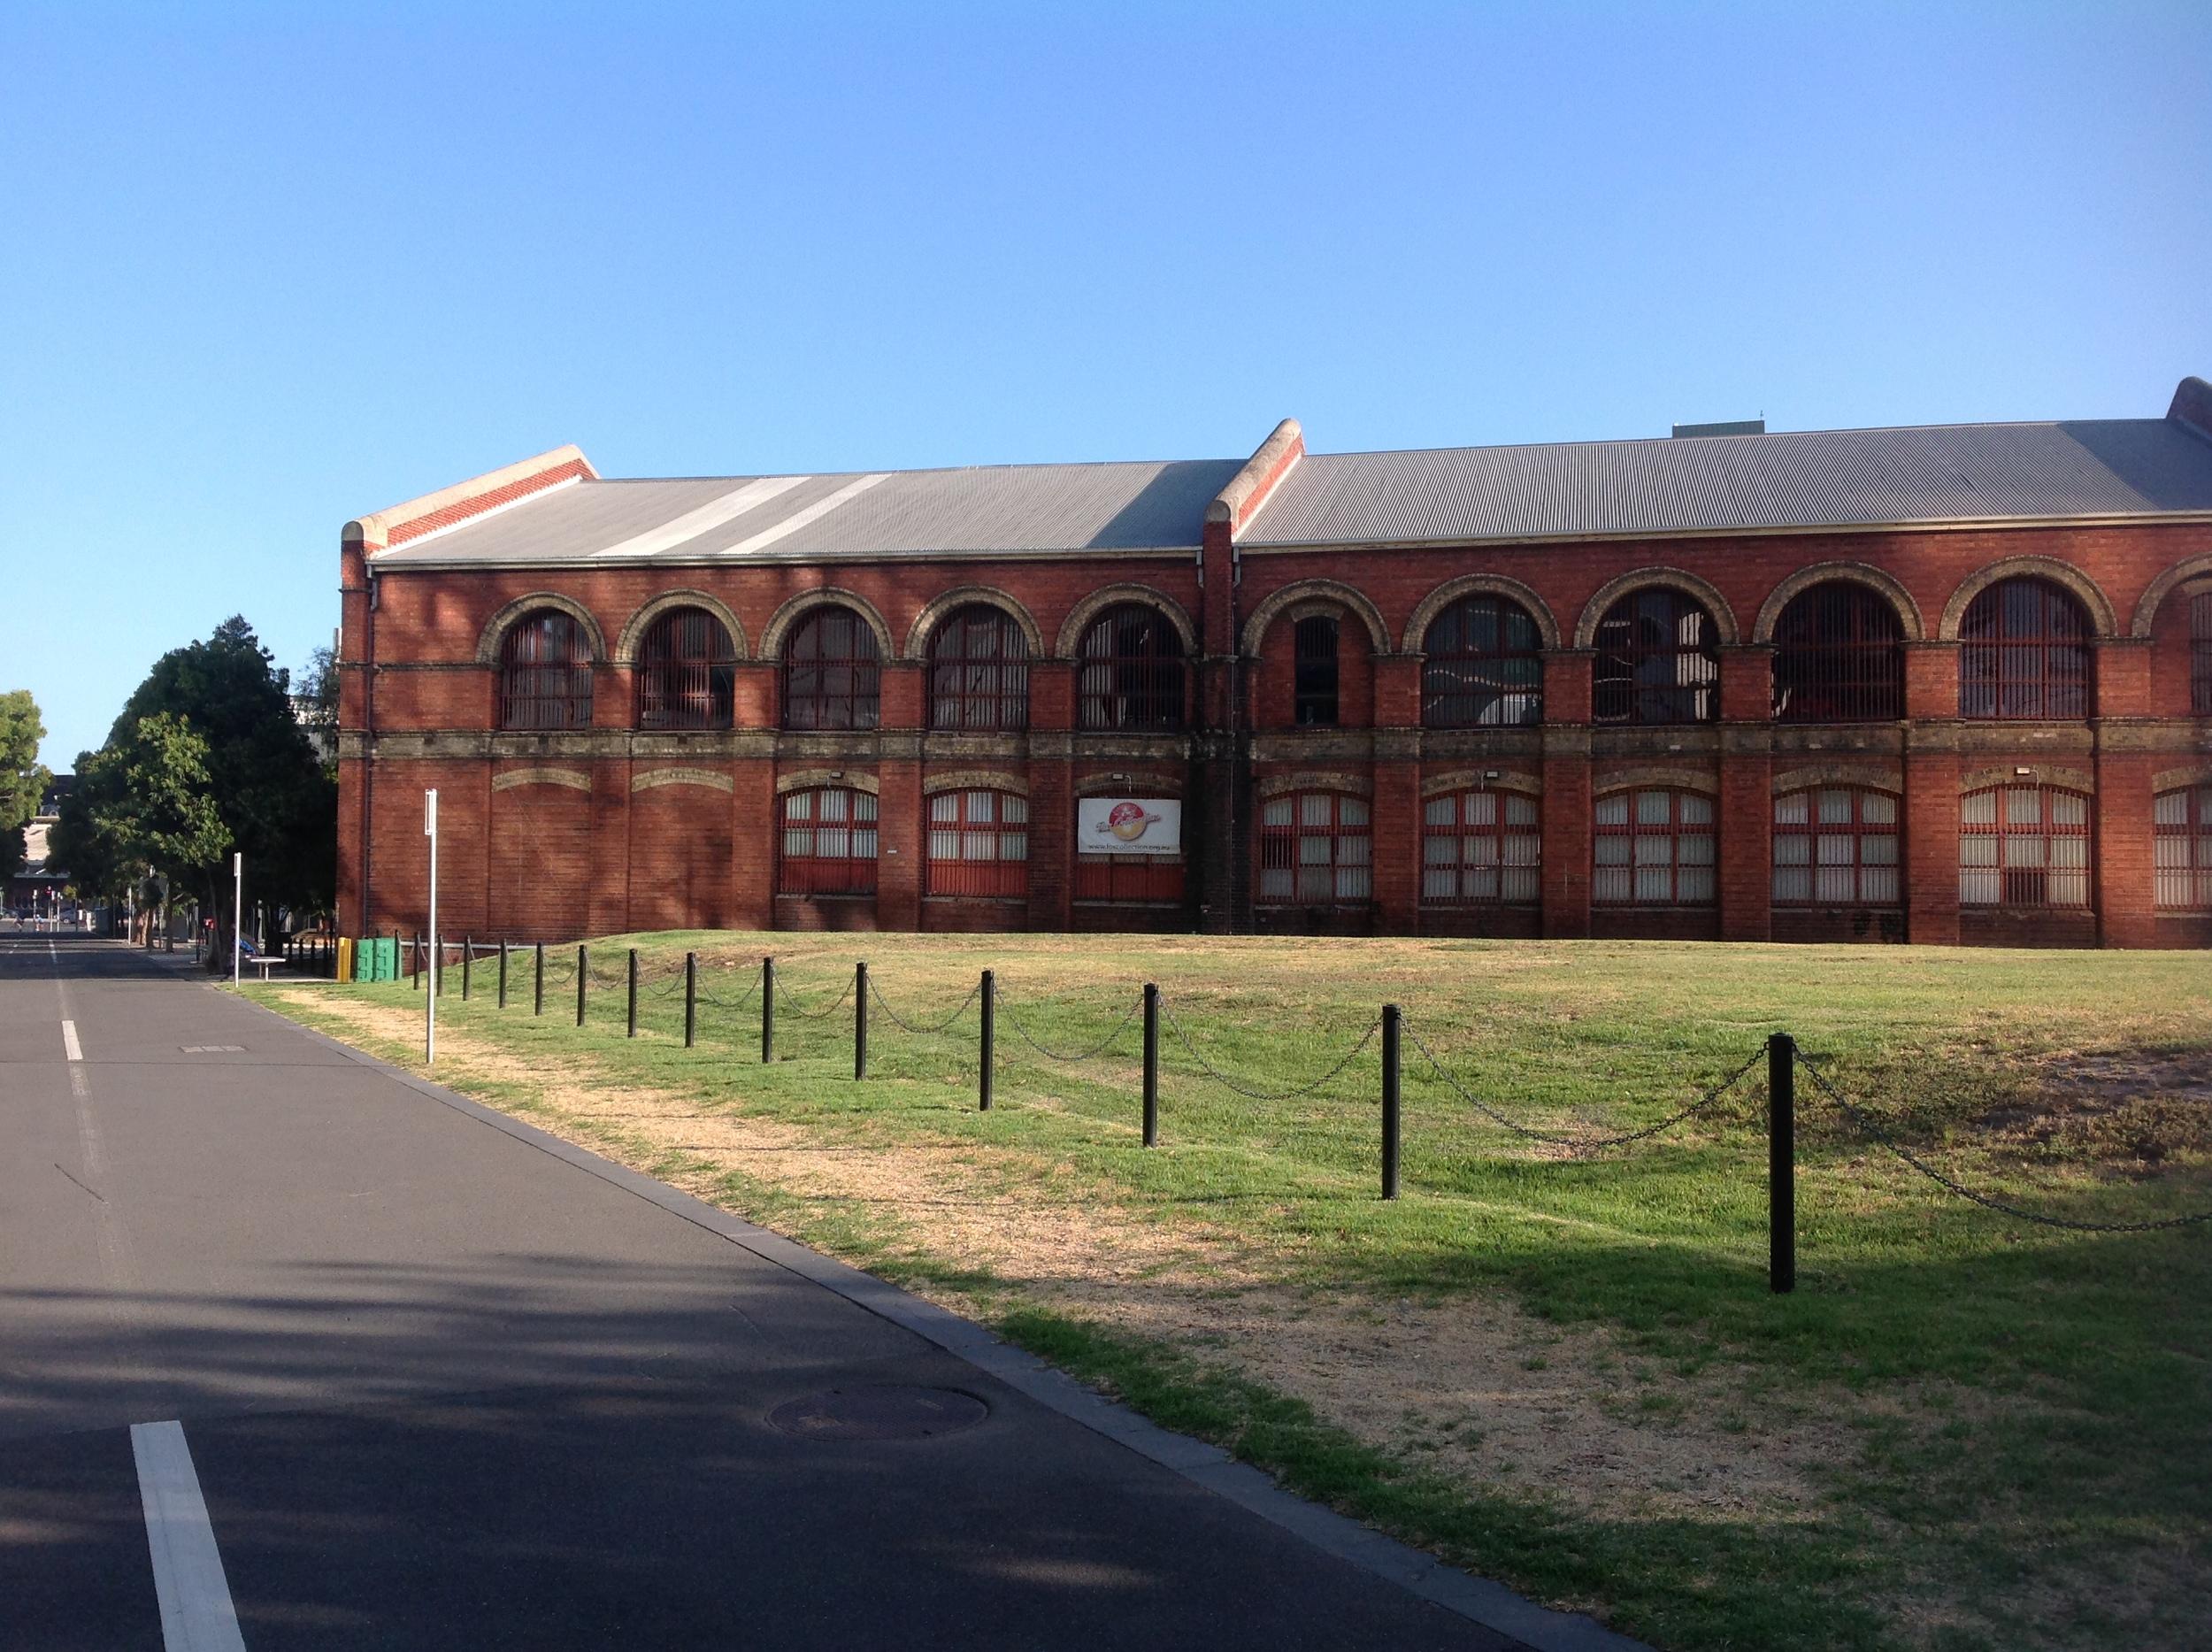 An old building, Melbourne